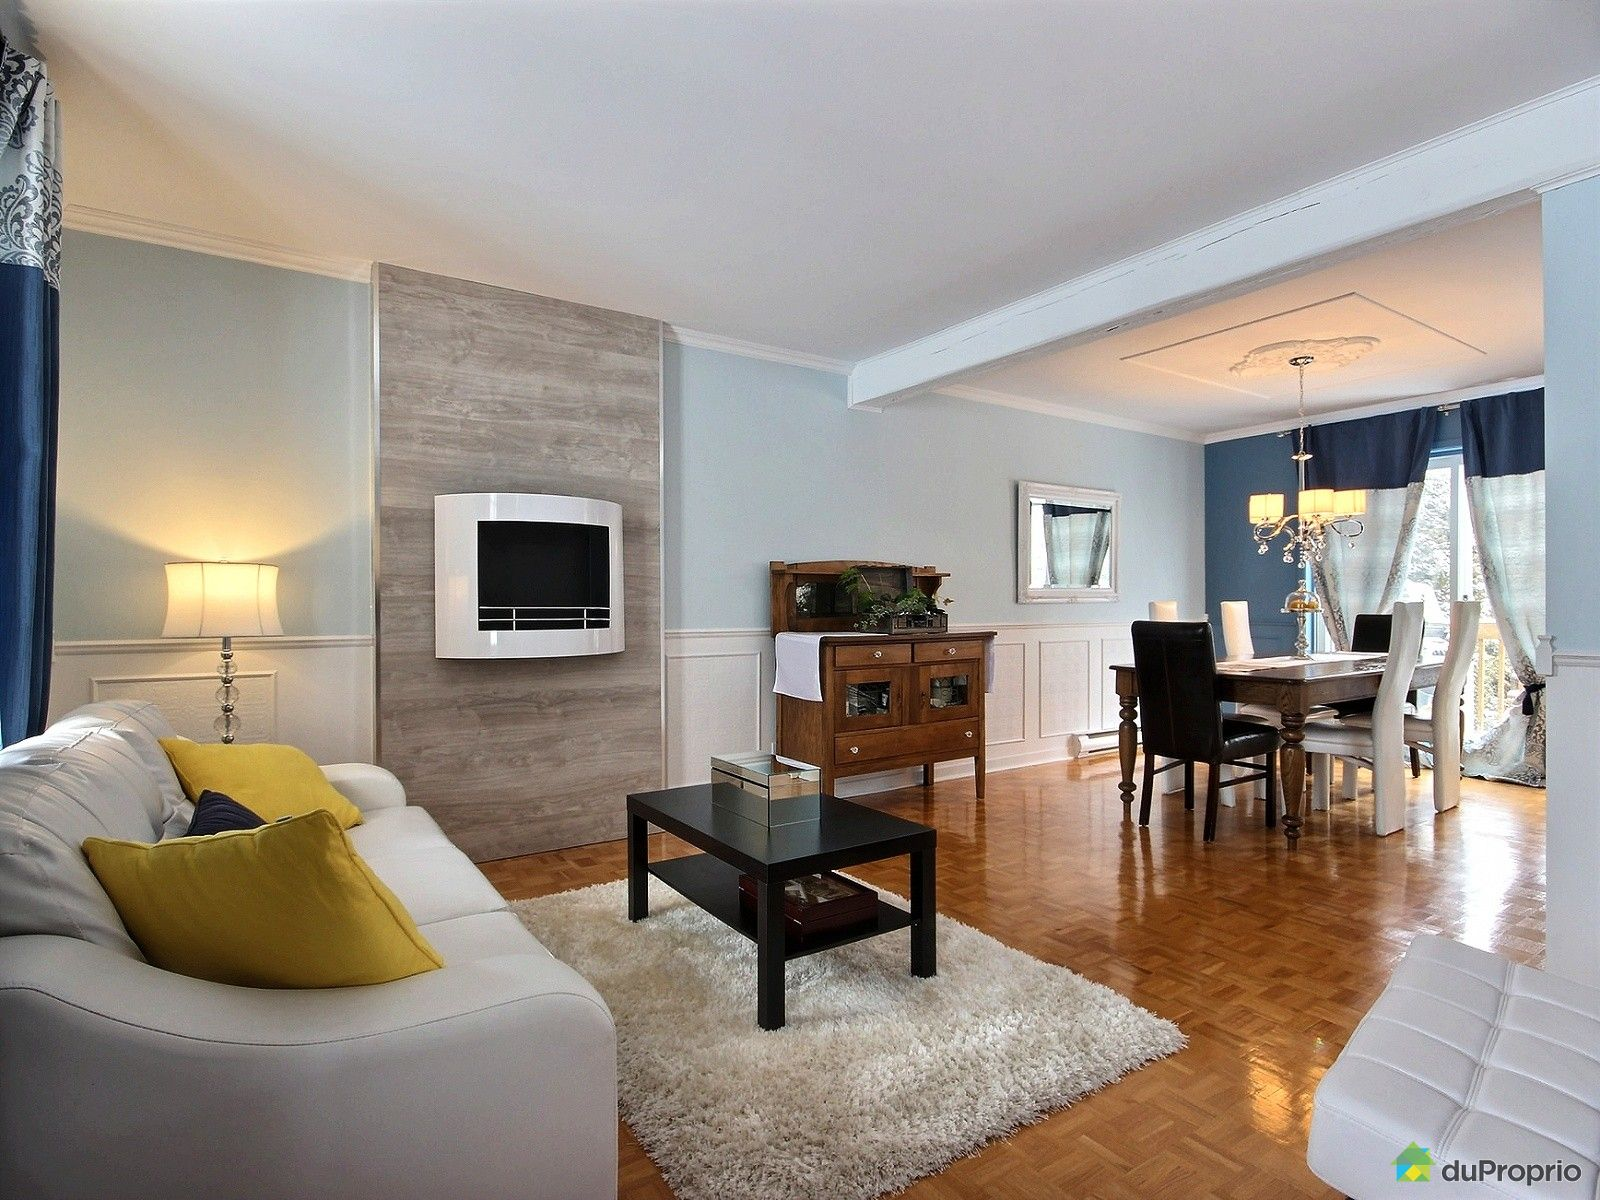 Maison vendre repentigny 1048 rue de namur immobilier for Salle a manger namur